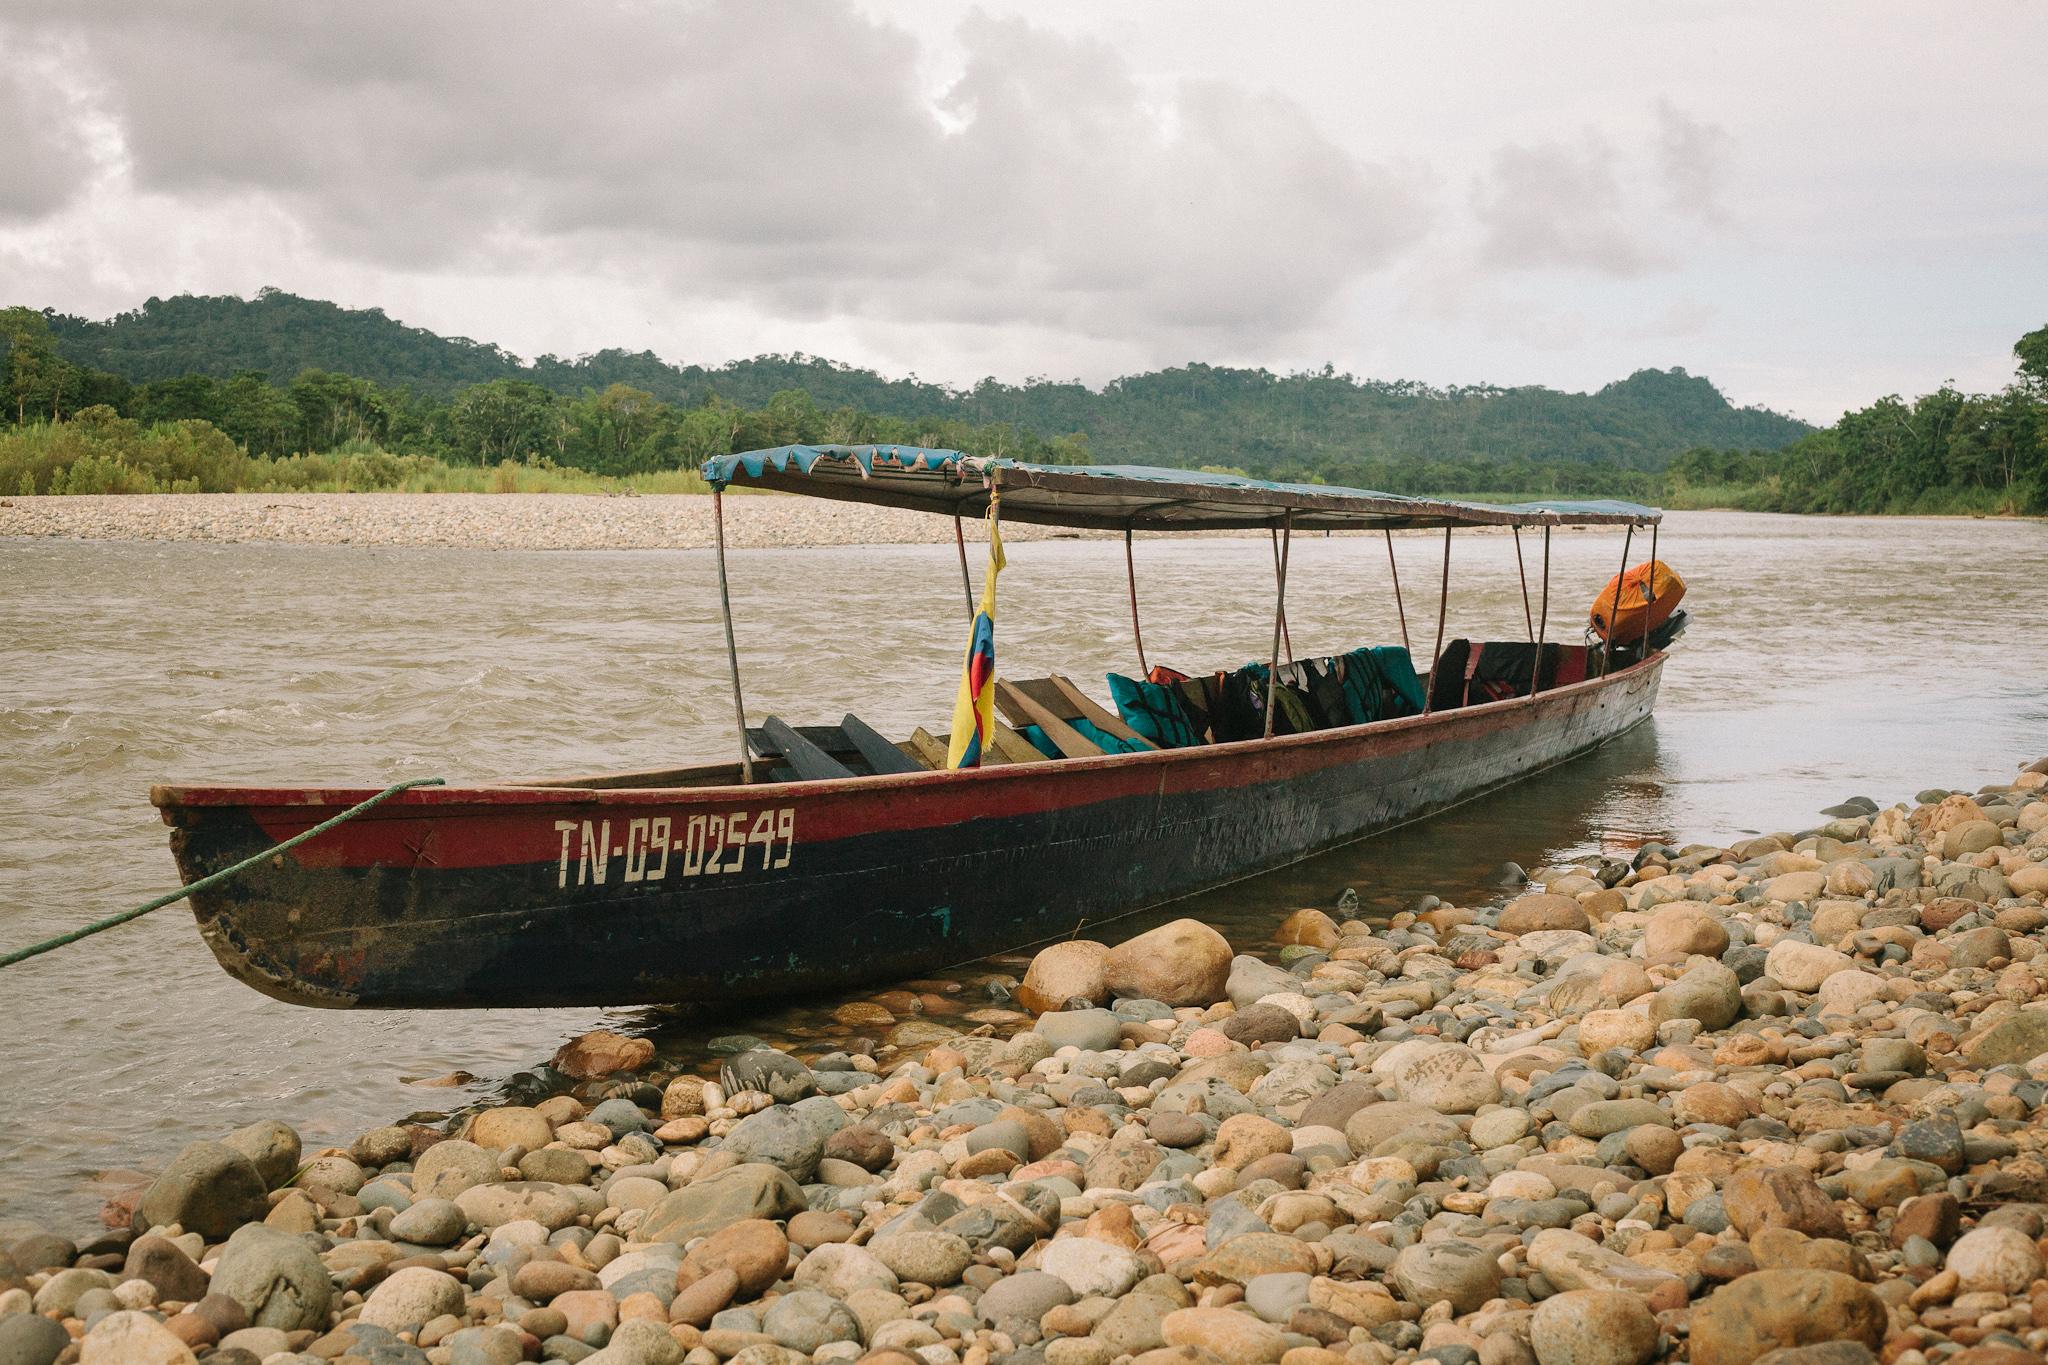 EcuadorQuito&Amazon_forwebsite2015_Jan2010_jenniferleahy-025.jpg